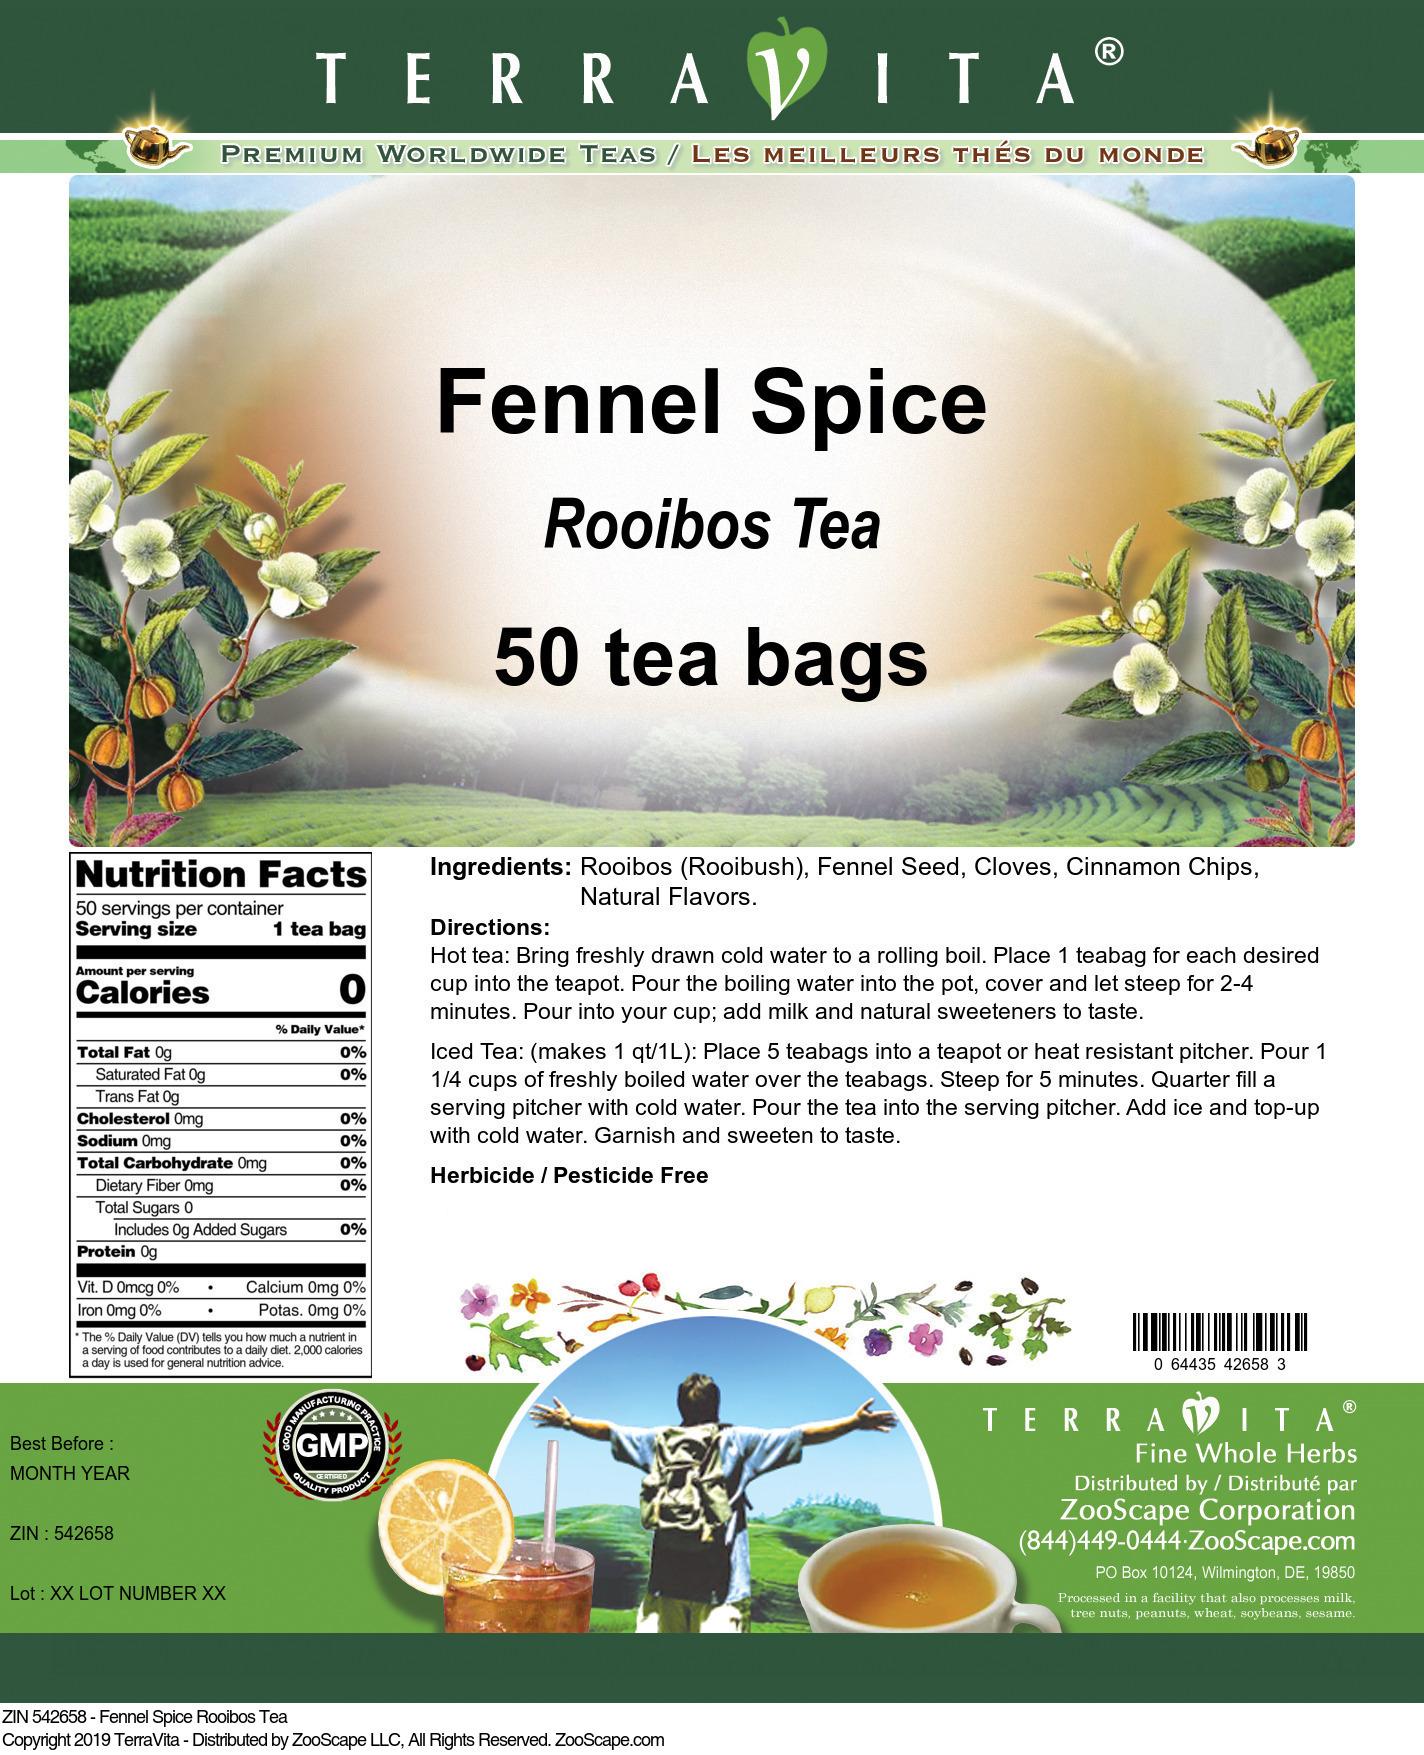 Fennel Spice Rooibos Tea